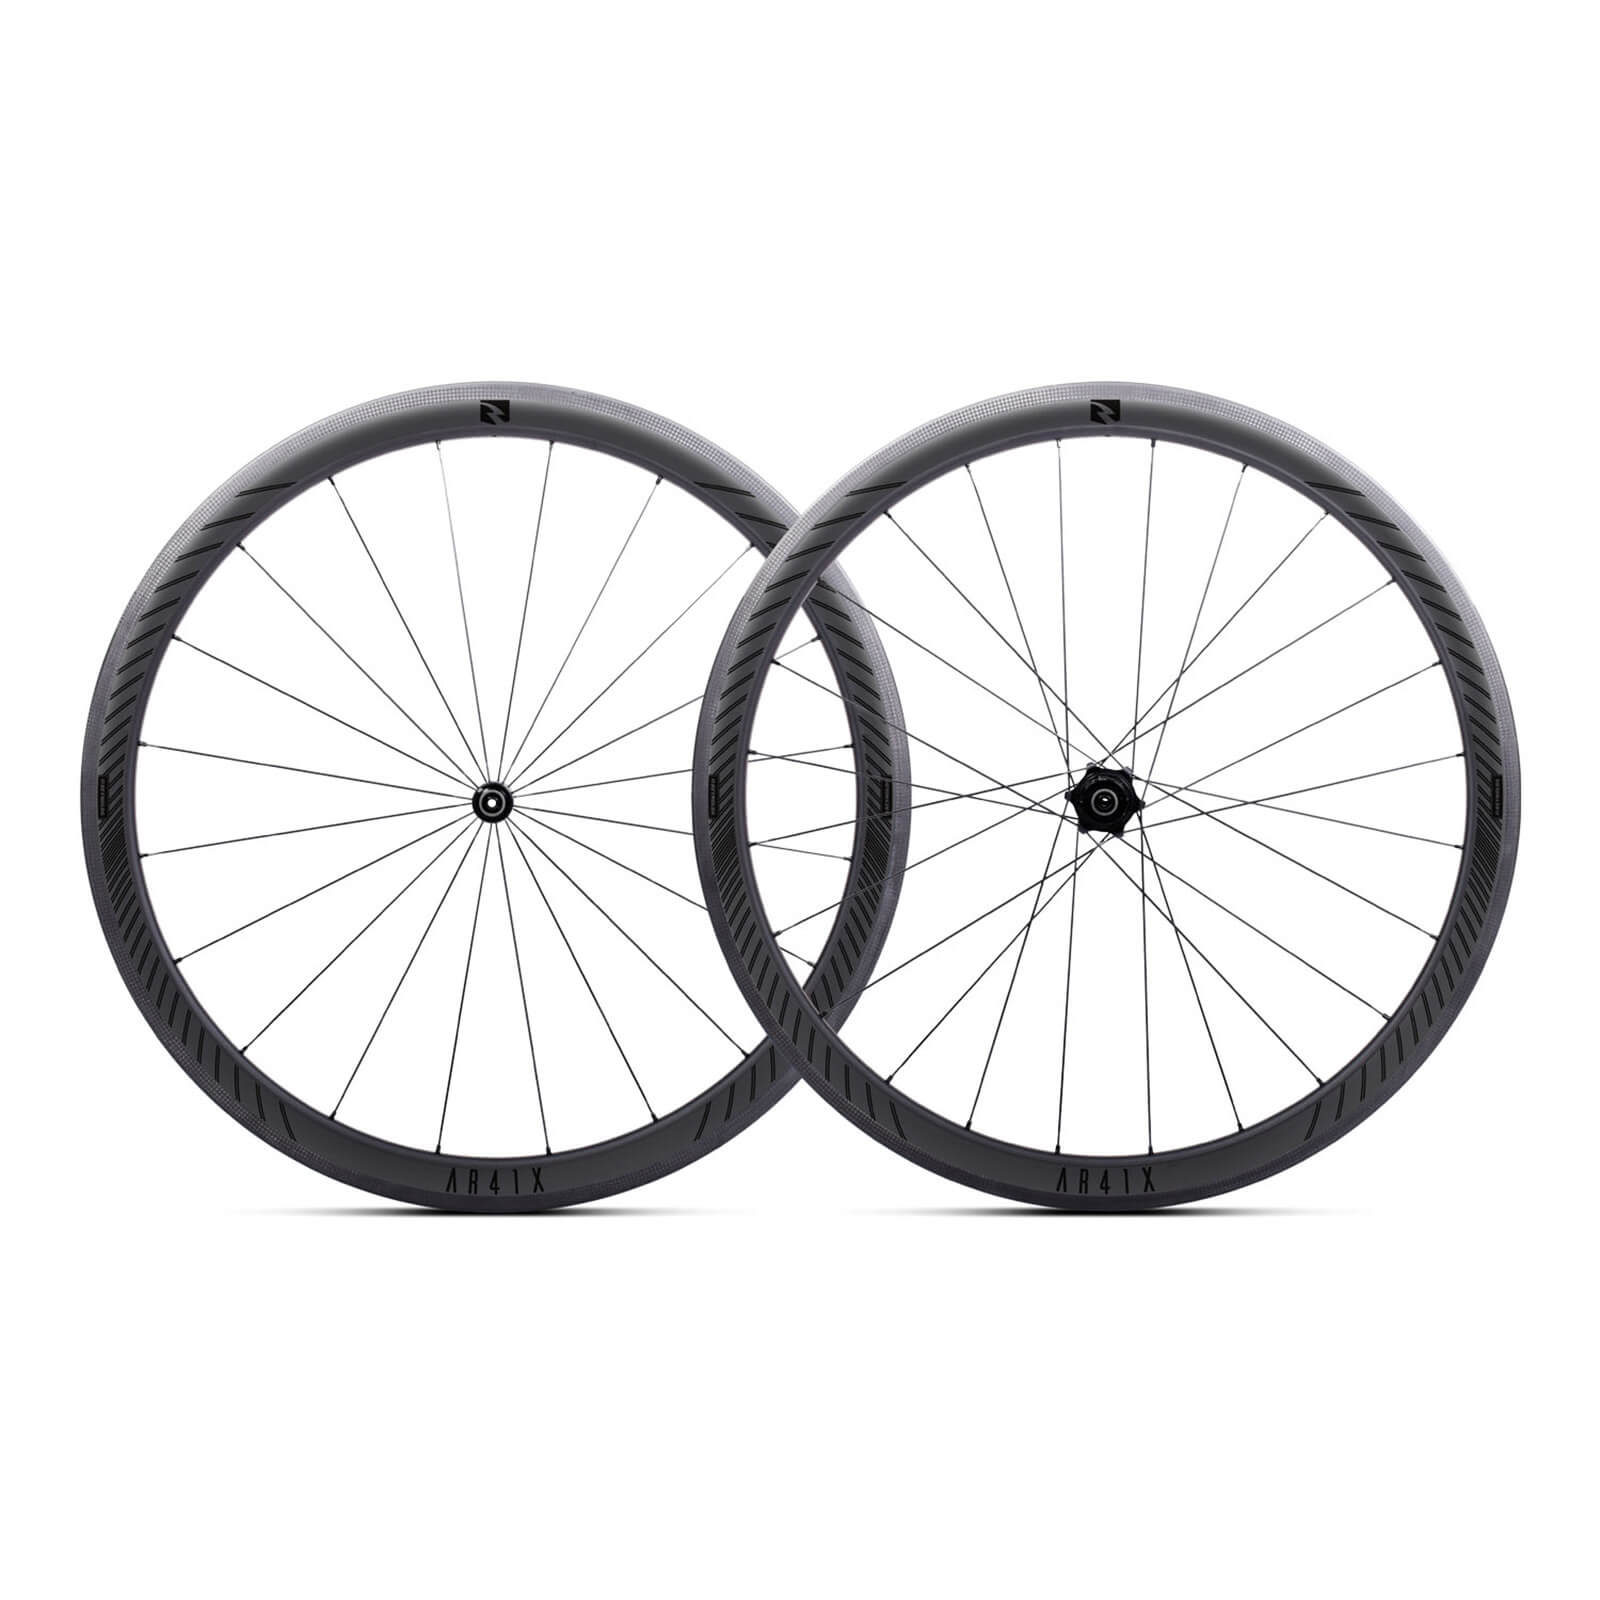 Reynolds ARX 41x Carbon Clincher Wheelset - Shimano/SRAM - Black